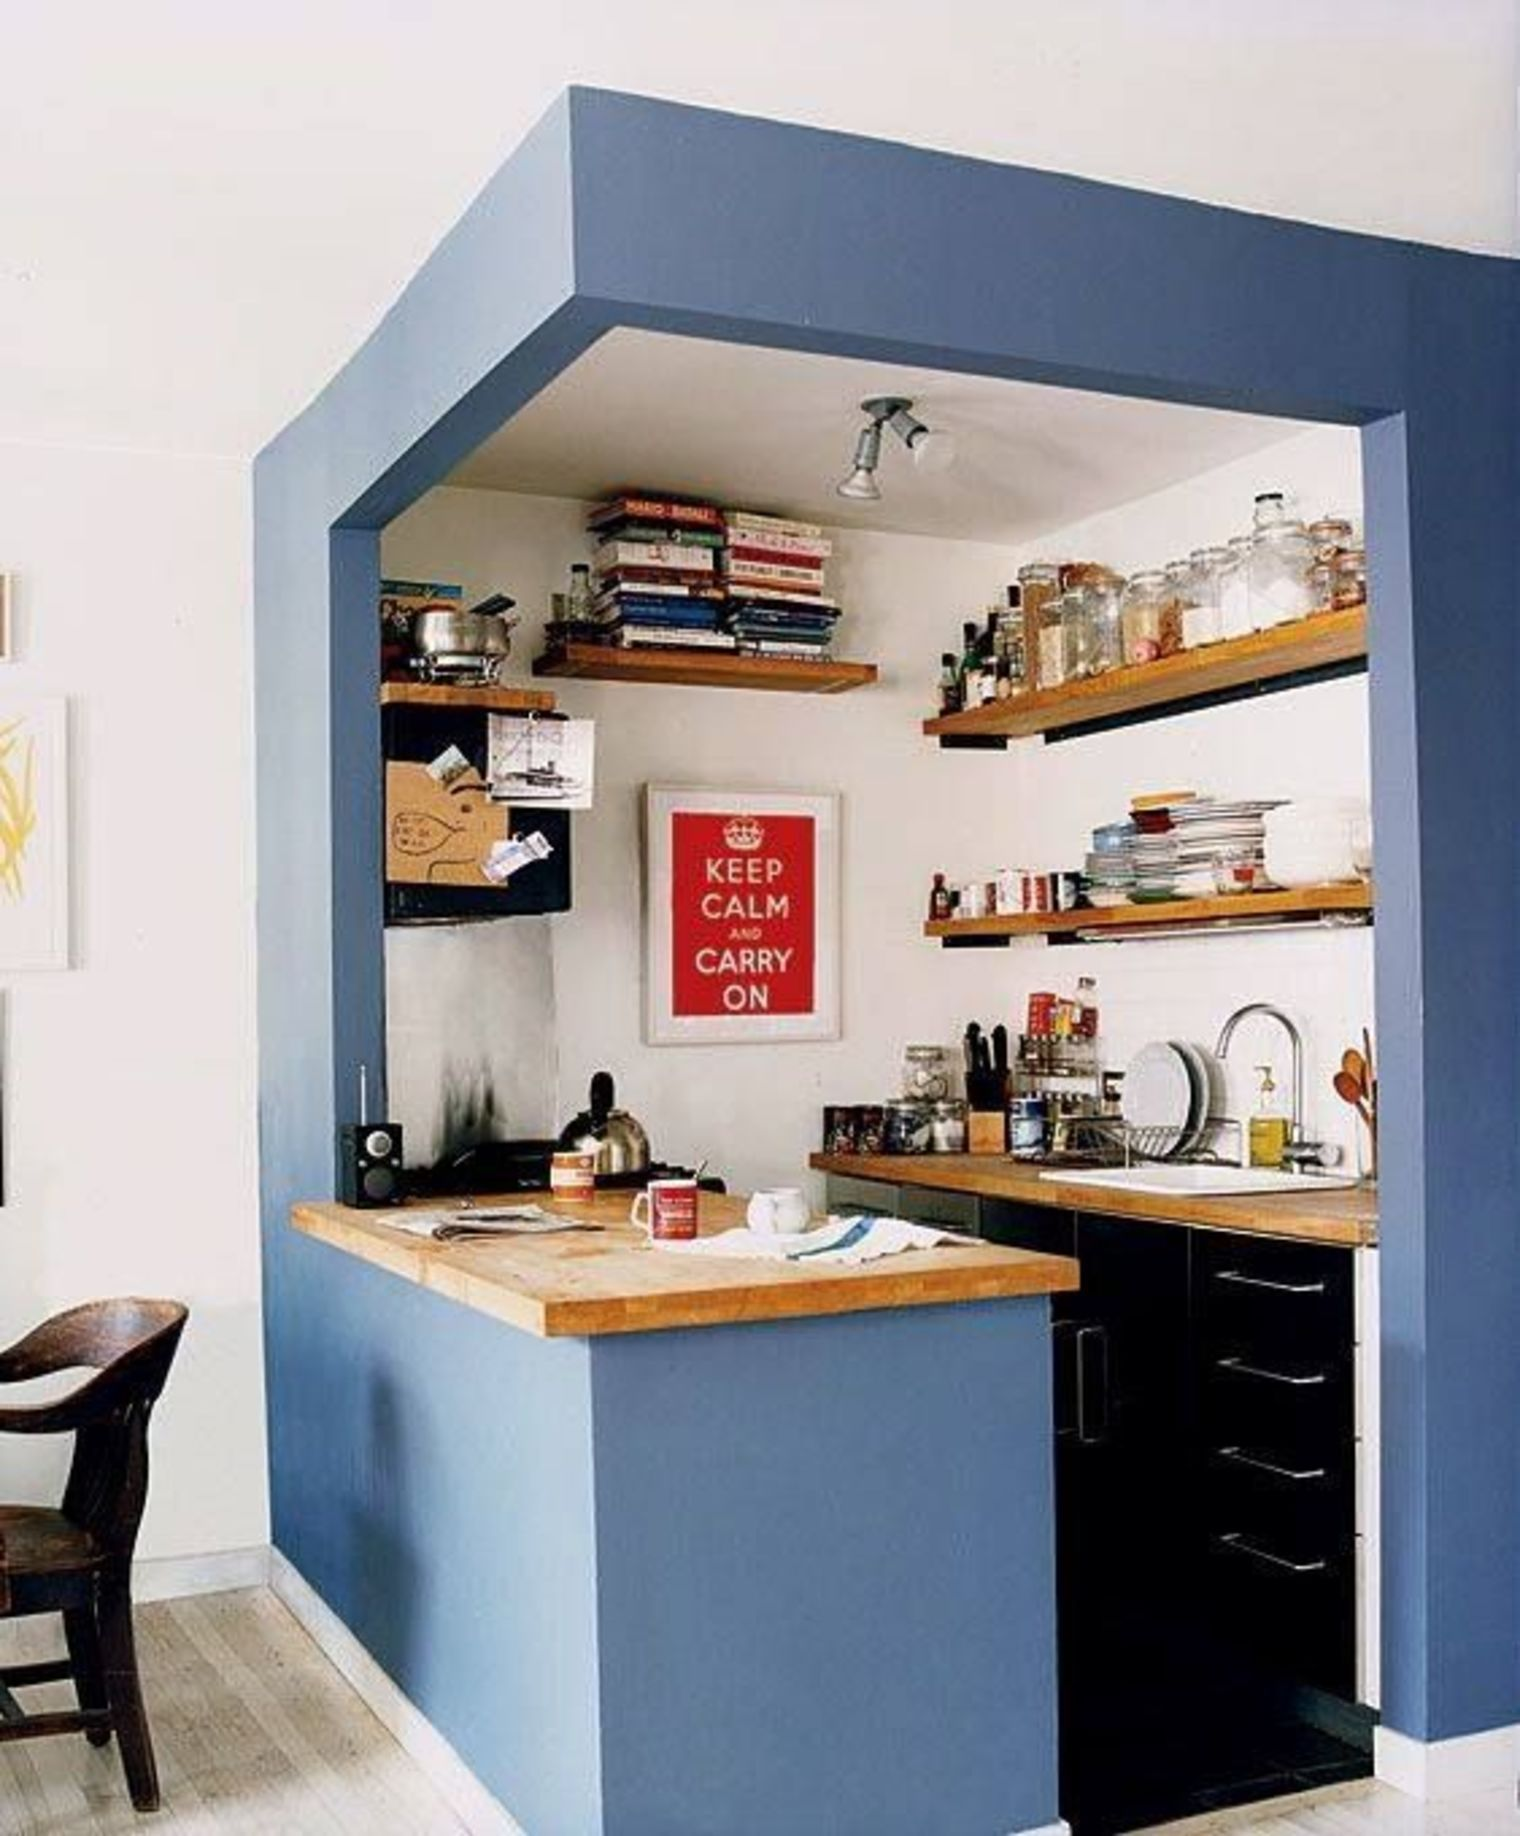 Cocina pequeña blanca con un marco en azul | colores de cocina ...